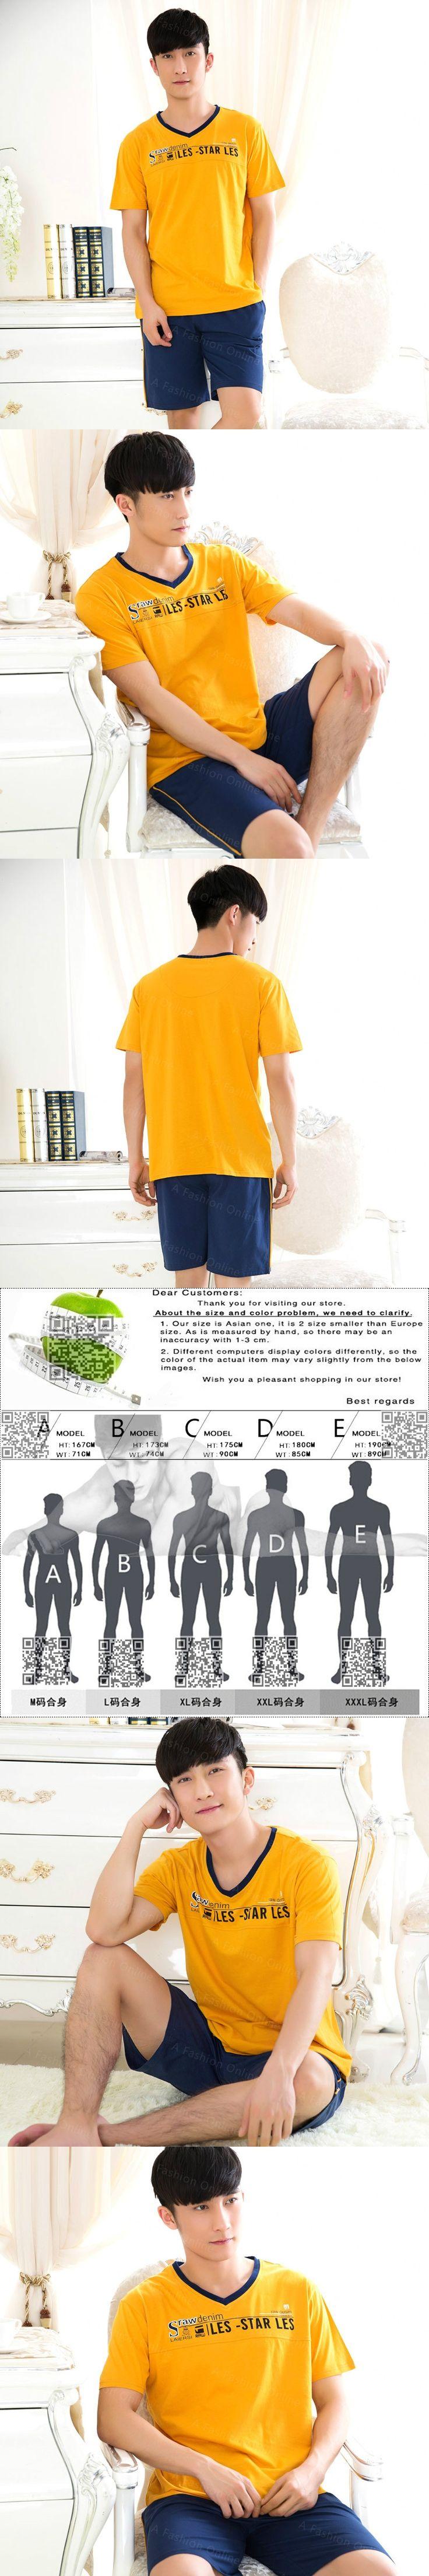 Men T Shirt Cotton Pajama Set Sleepwear Sexy Mens Underwear Tees Undershirts Tshirts Brand Casual Short Sleeve Navy Blue Shorts